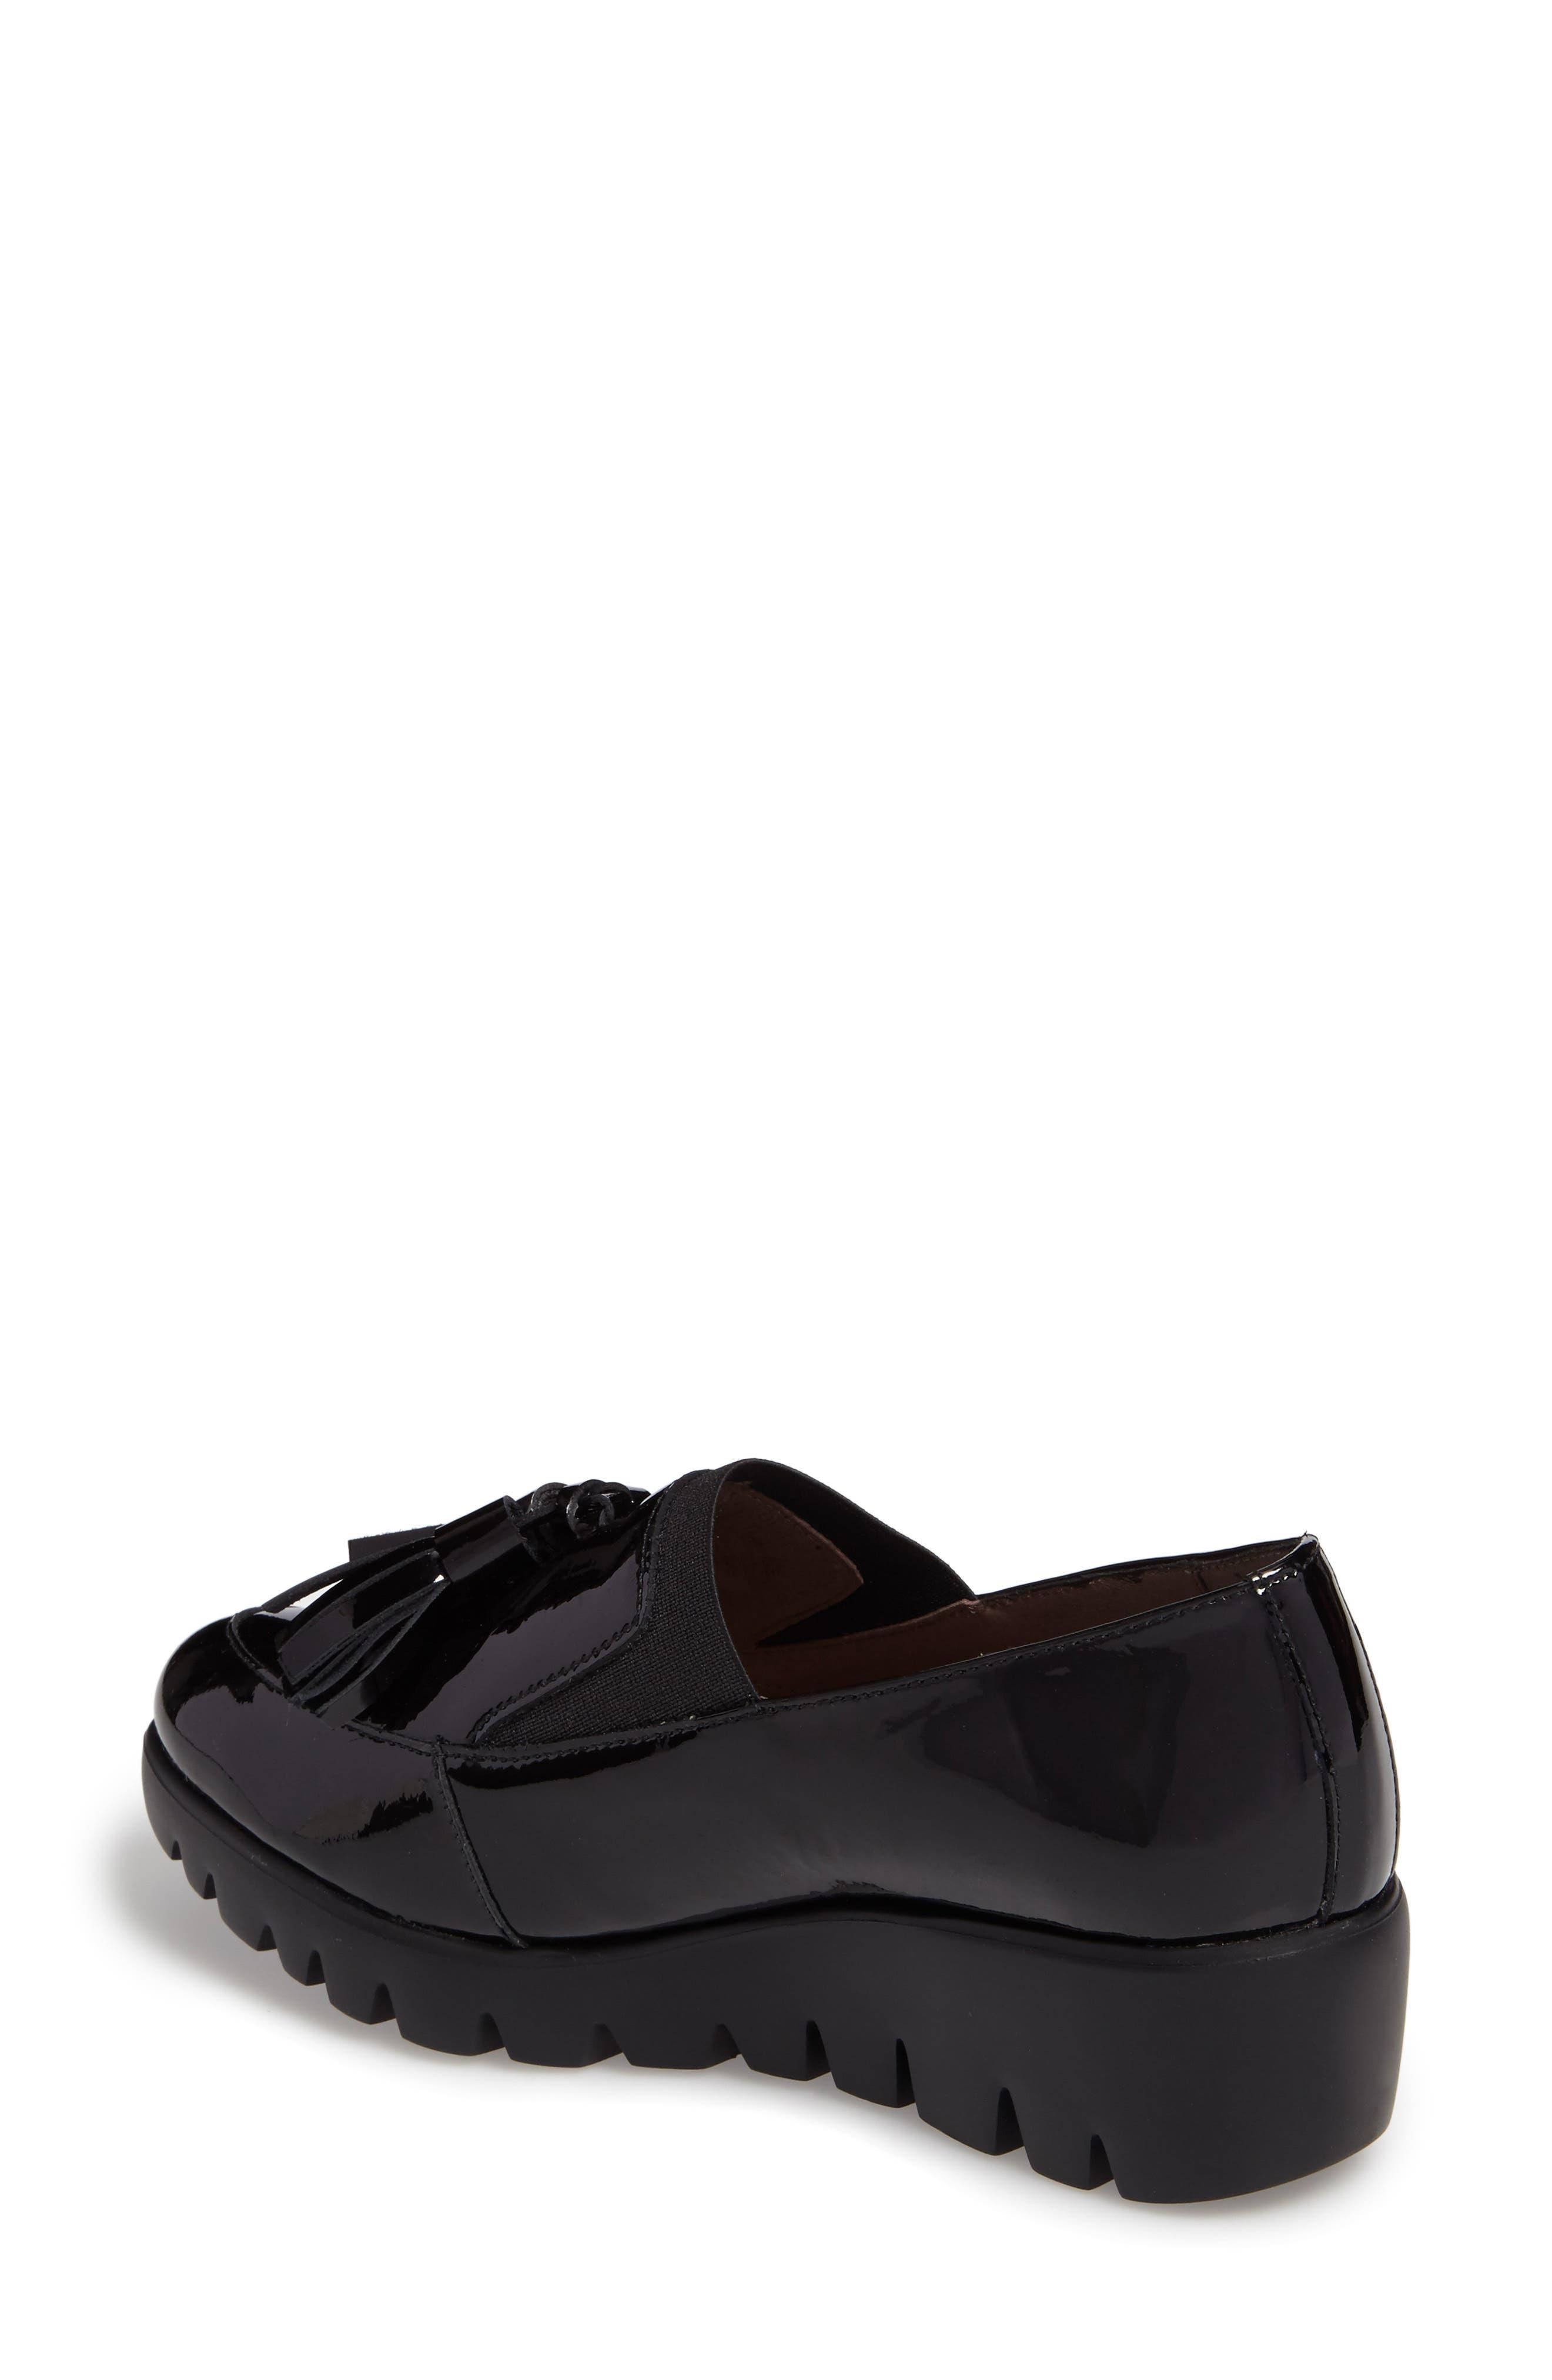 Womens Wonders Shoes Nordstrom D Island Slip On Loafers Comfort Leather Dark Brown